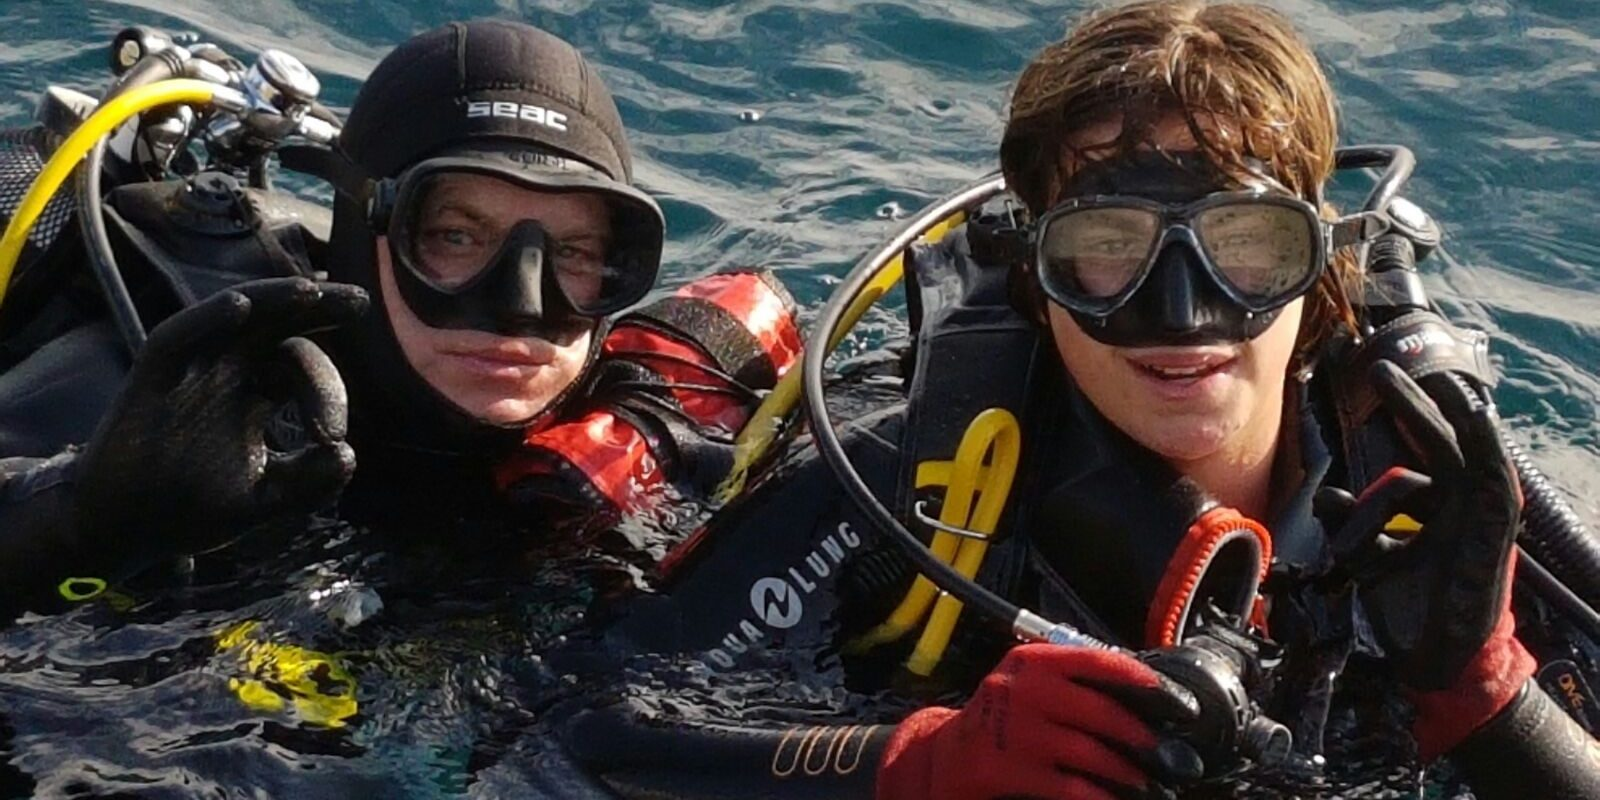 Diving spot: La Herradura – 20 min